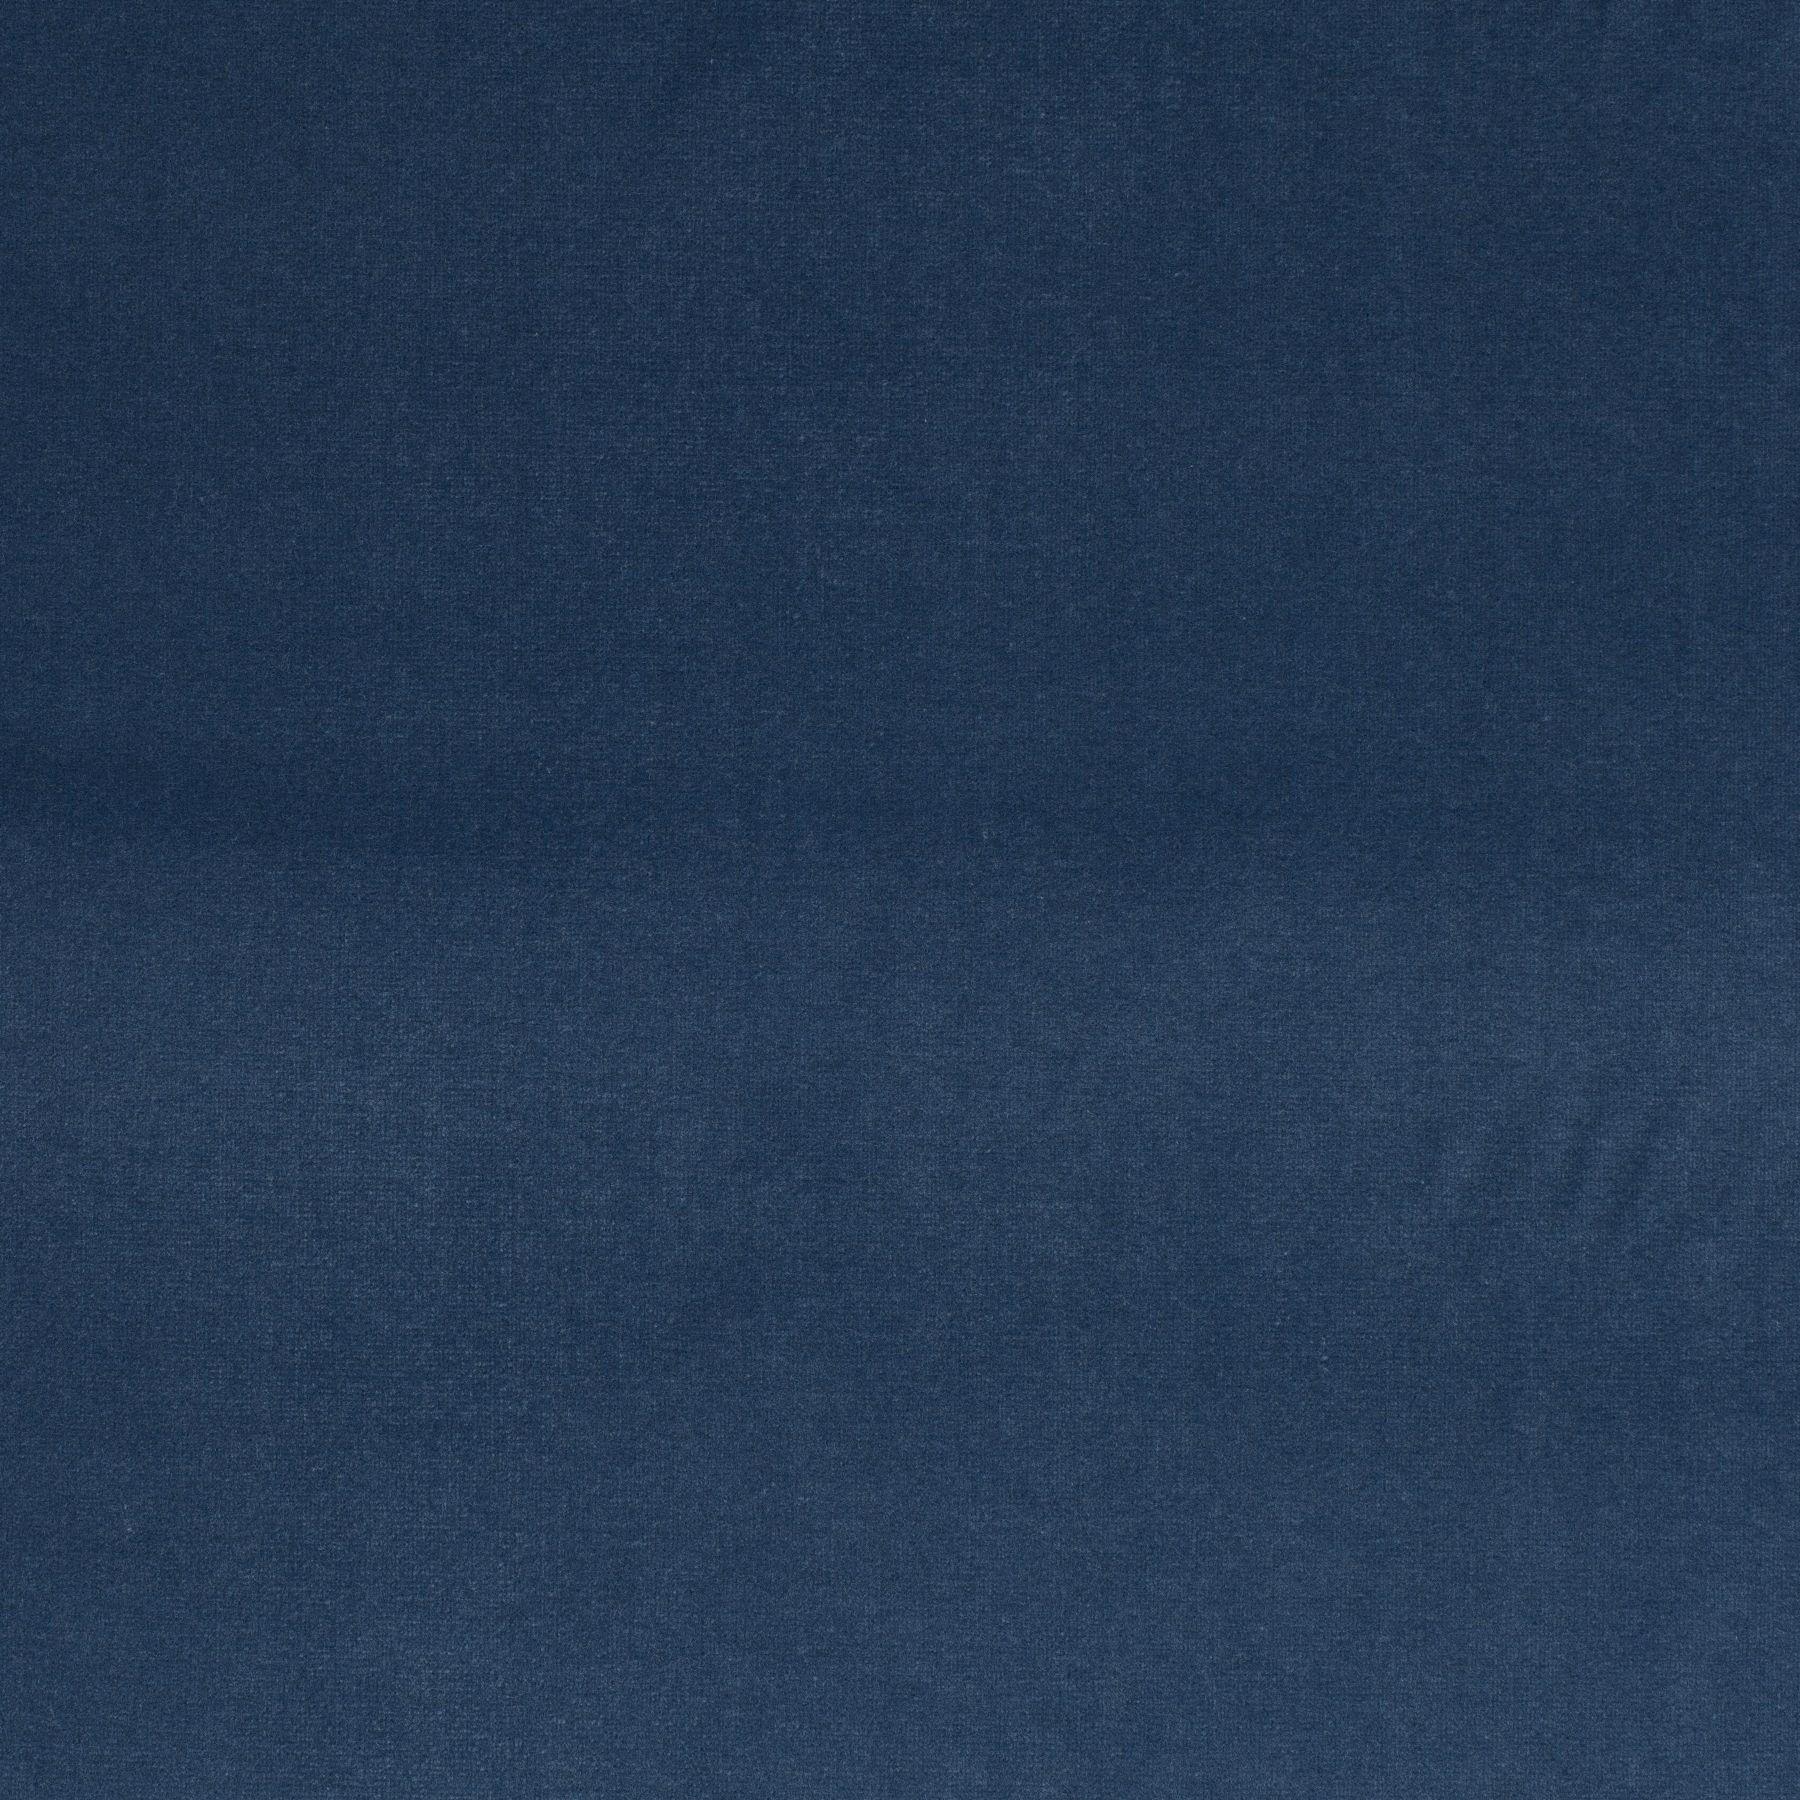 upholstery fabric velluto 1 3120 056 jab anstoetz fabrics. Black Bedroom Furniture Sets. Home Design Ideas